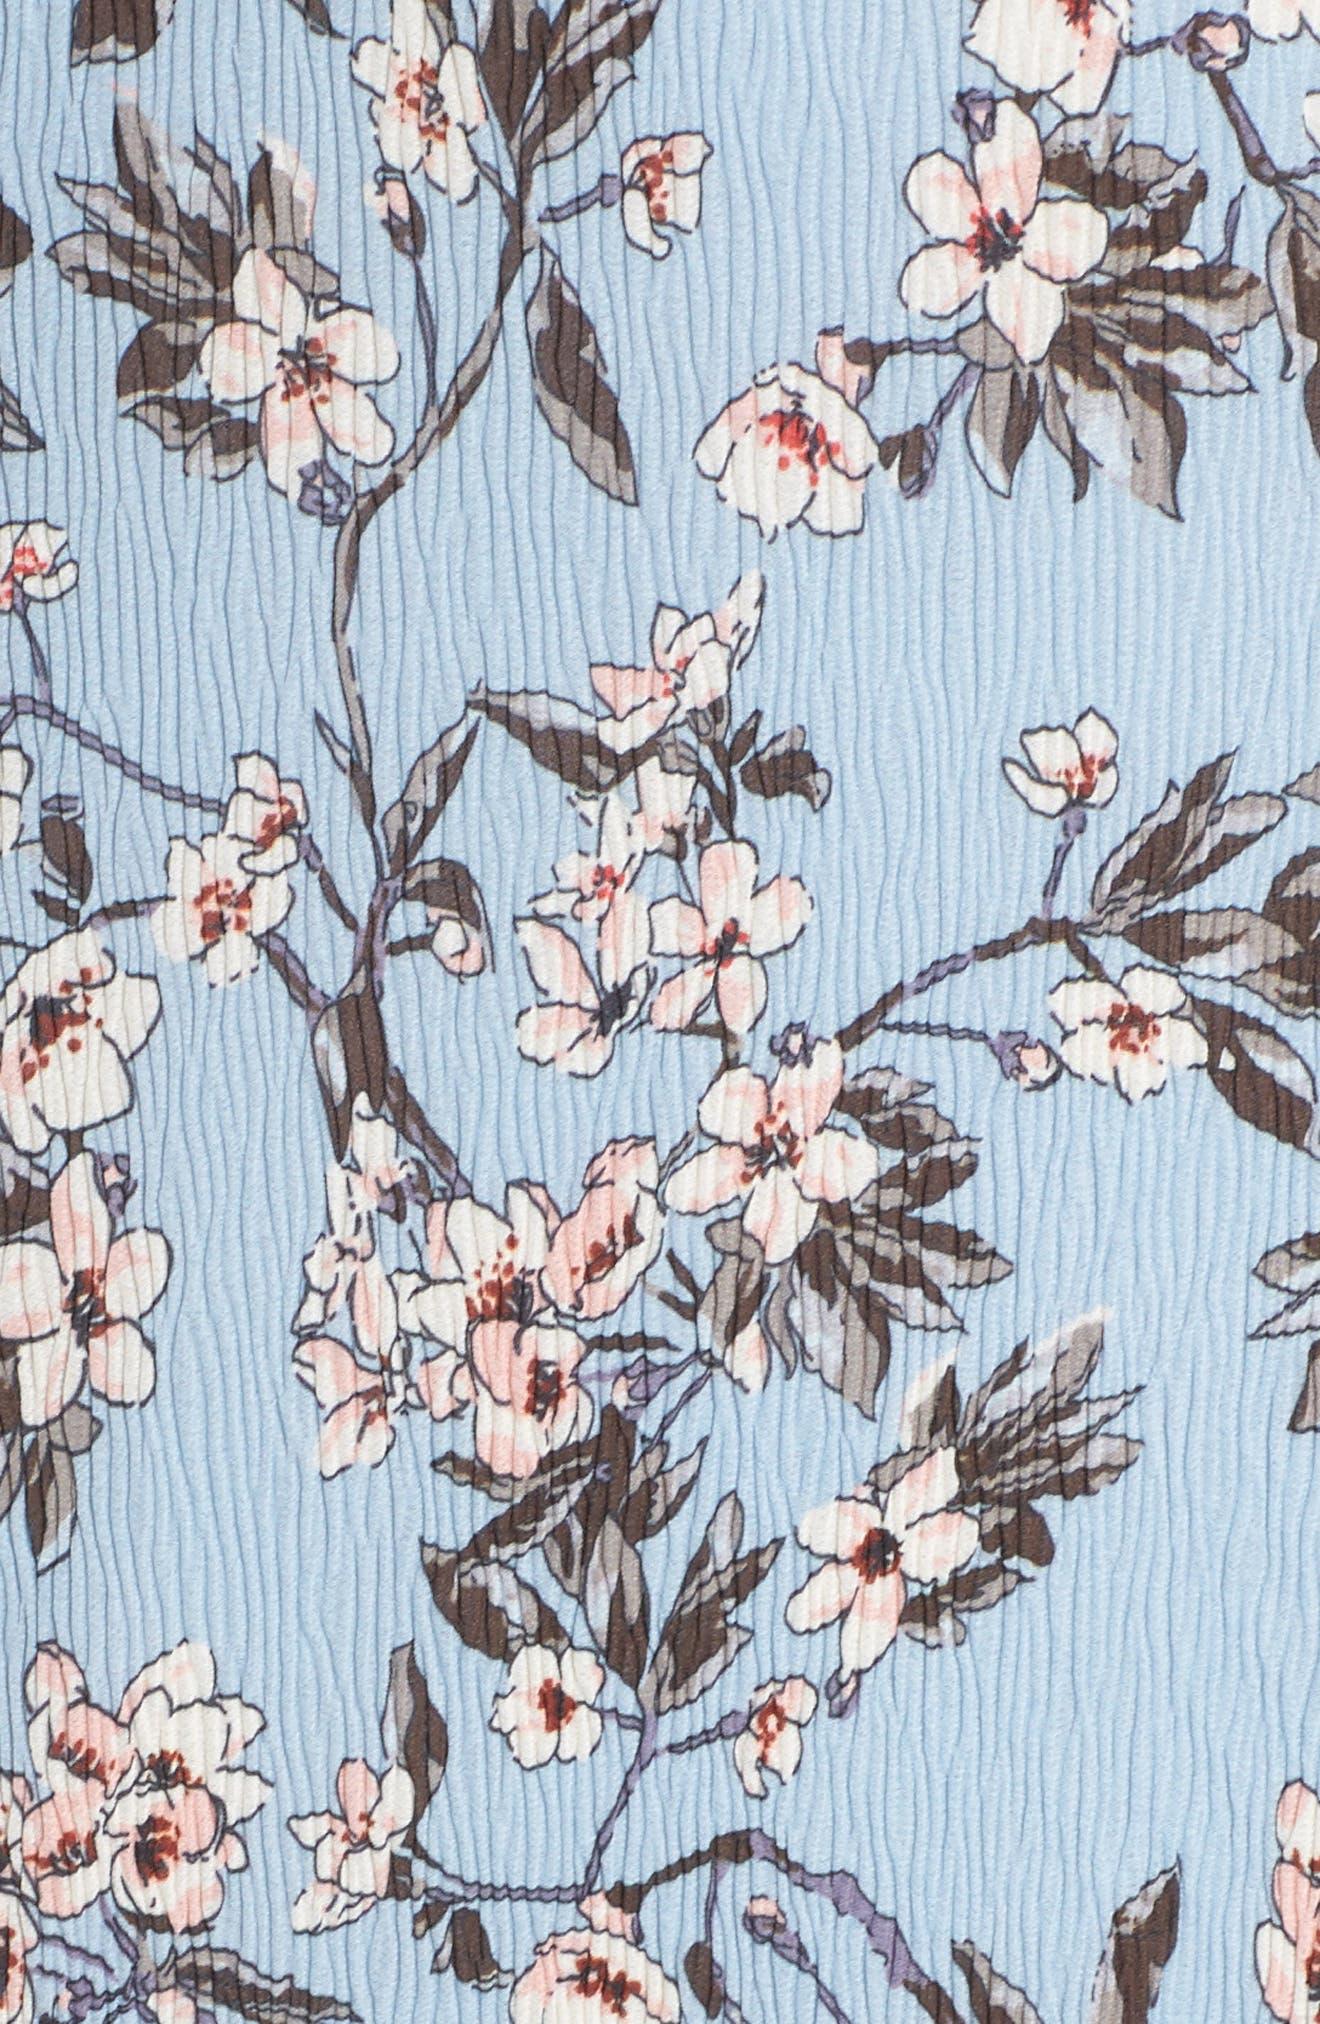 Floral Print High/Low Halter Dress,                             Alternate thumbnail 5, color,                             450